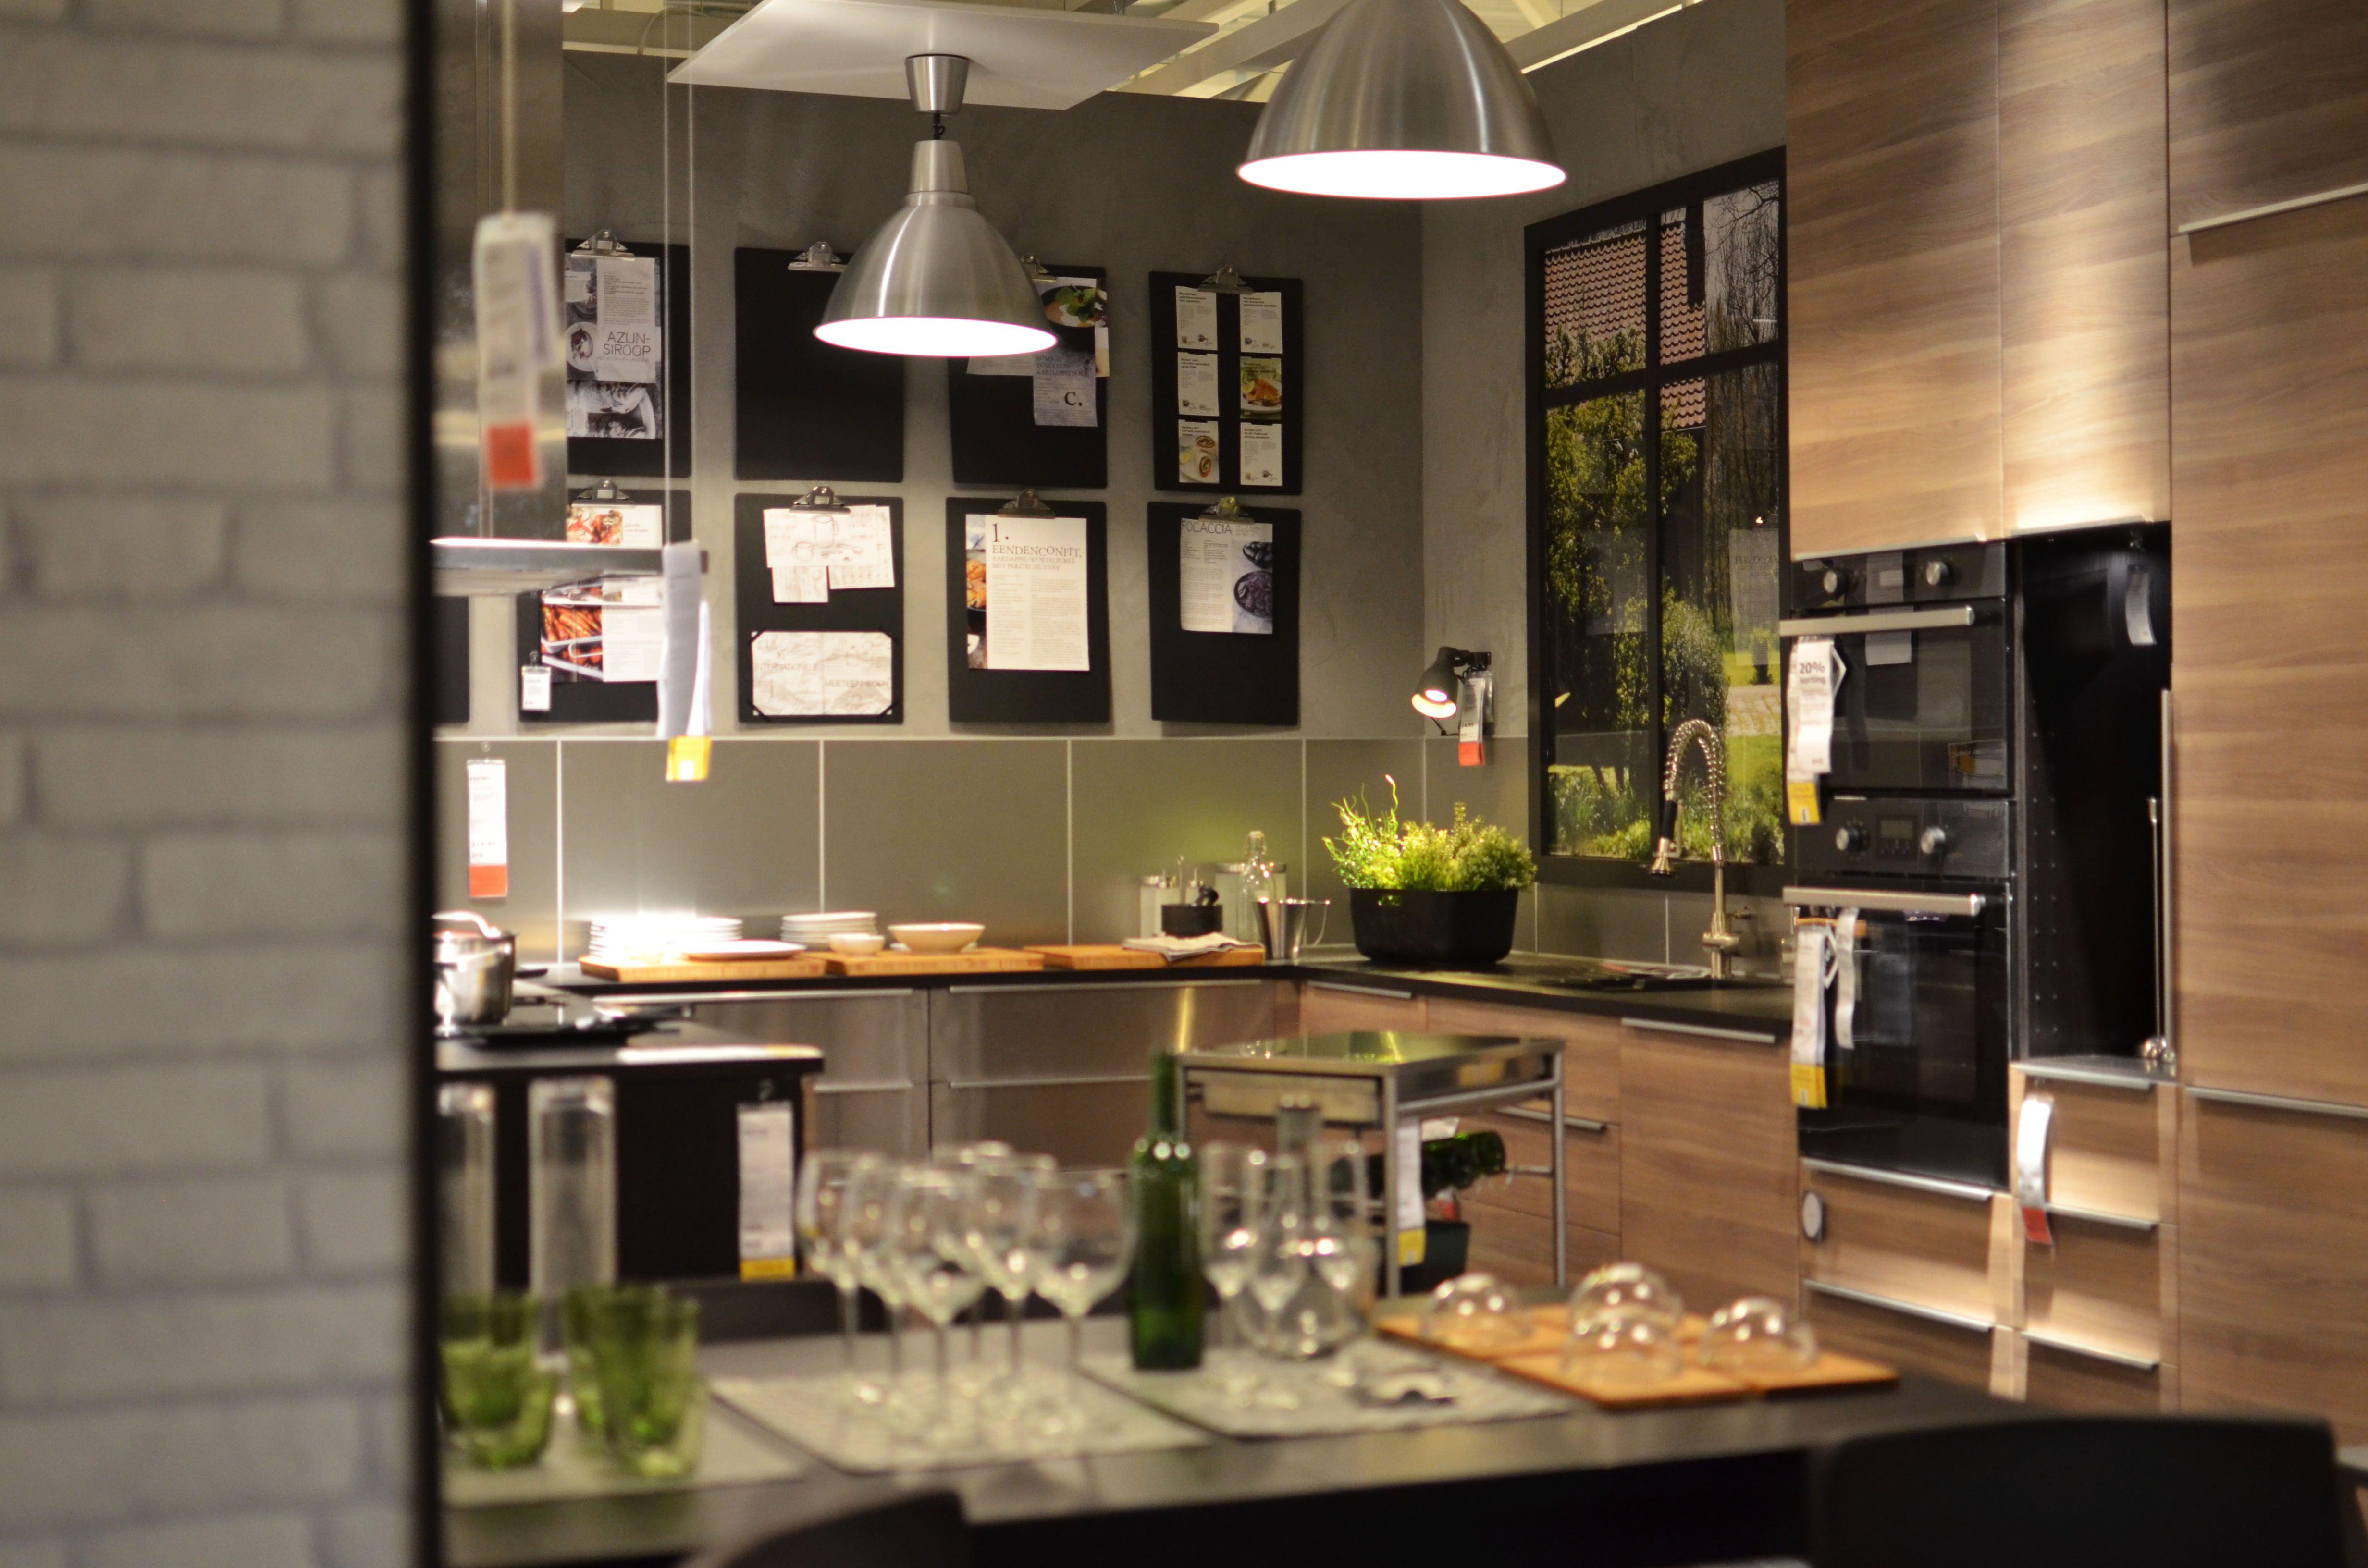 Cuisine Brokhult Ikea Cuisine Ika Haggeby With Cuisine Brokhult